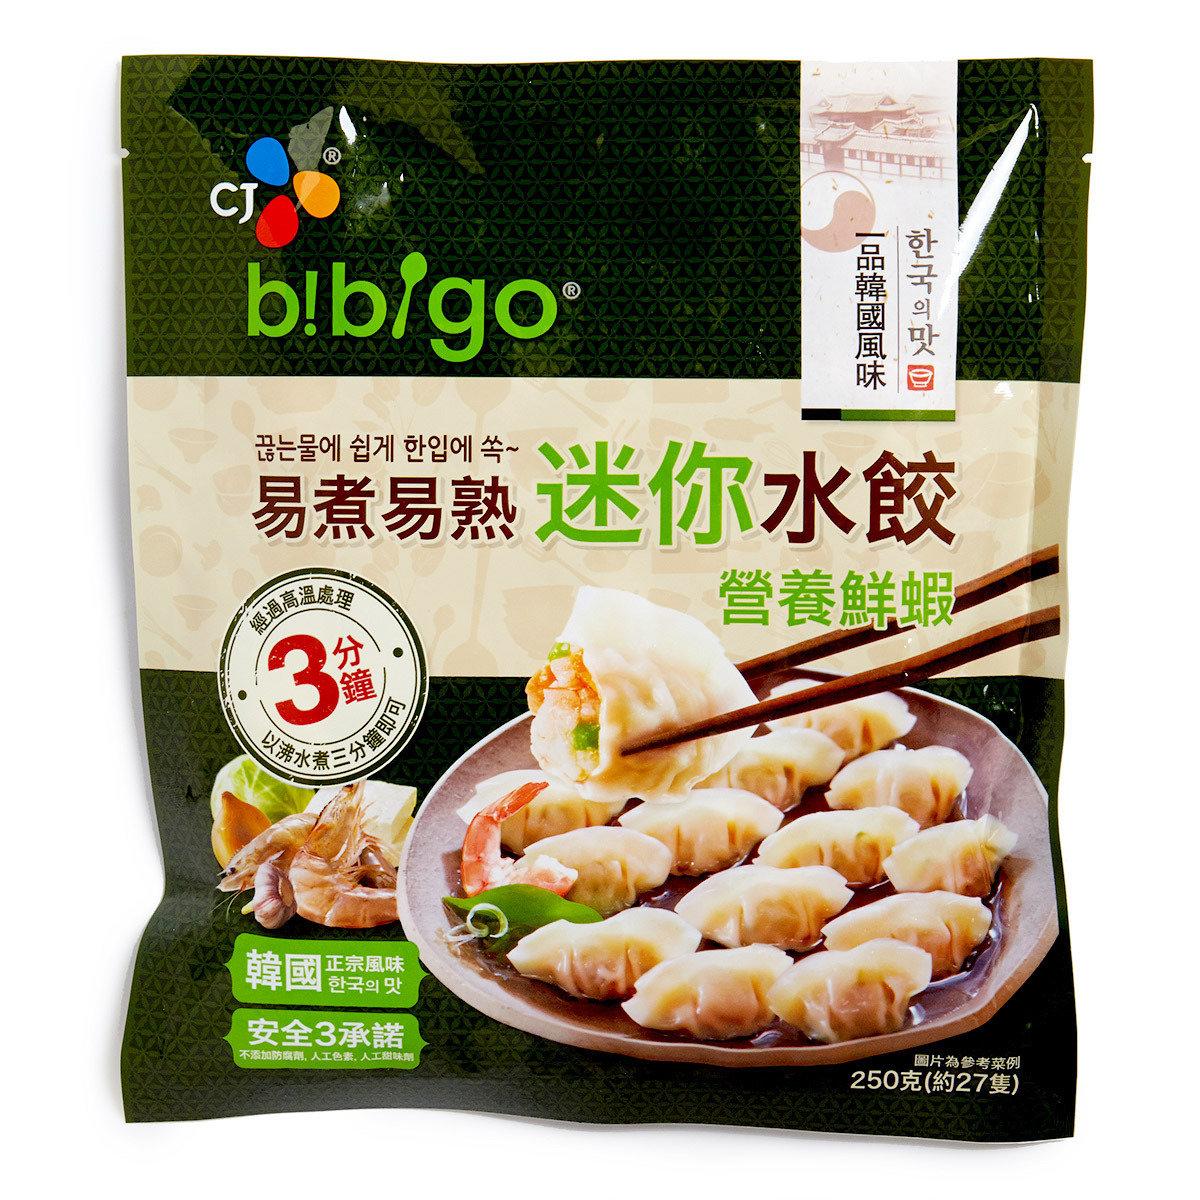 Bibigo 營養鮮蝦迷你水餃 (急凍)